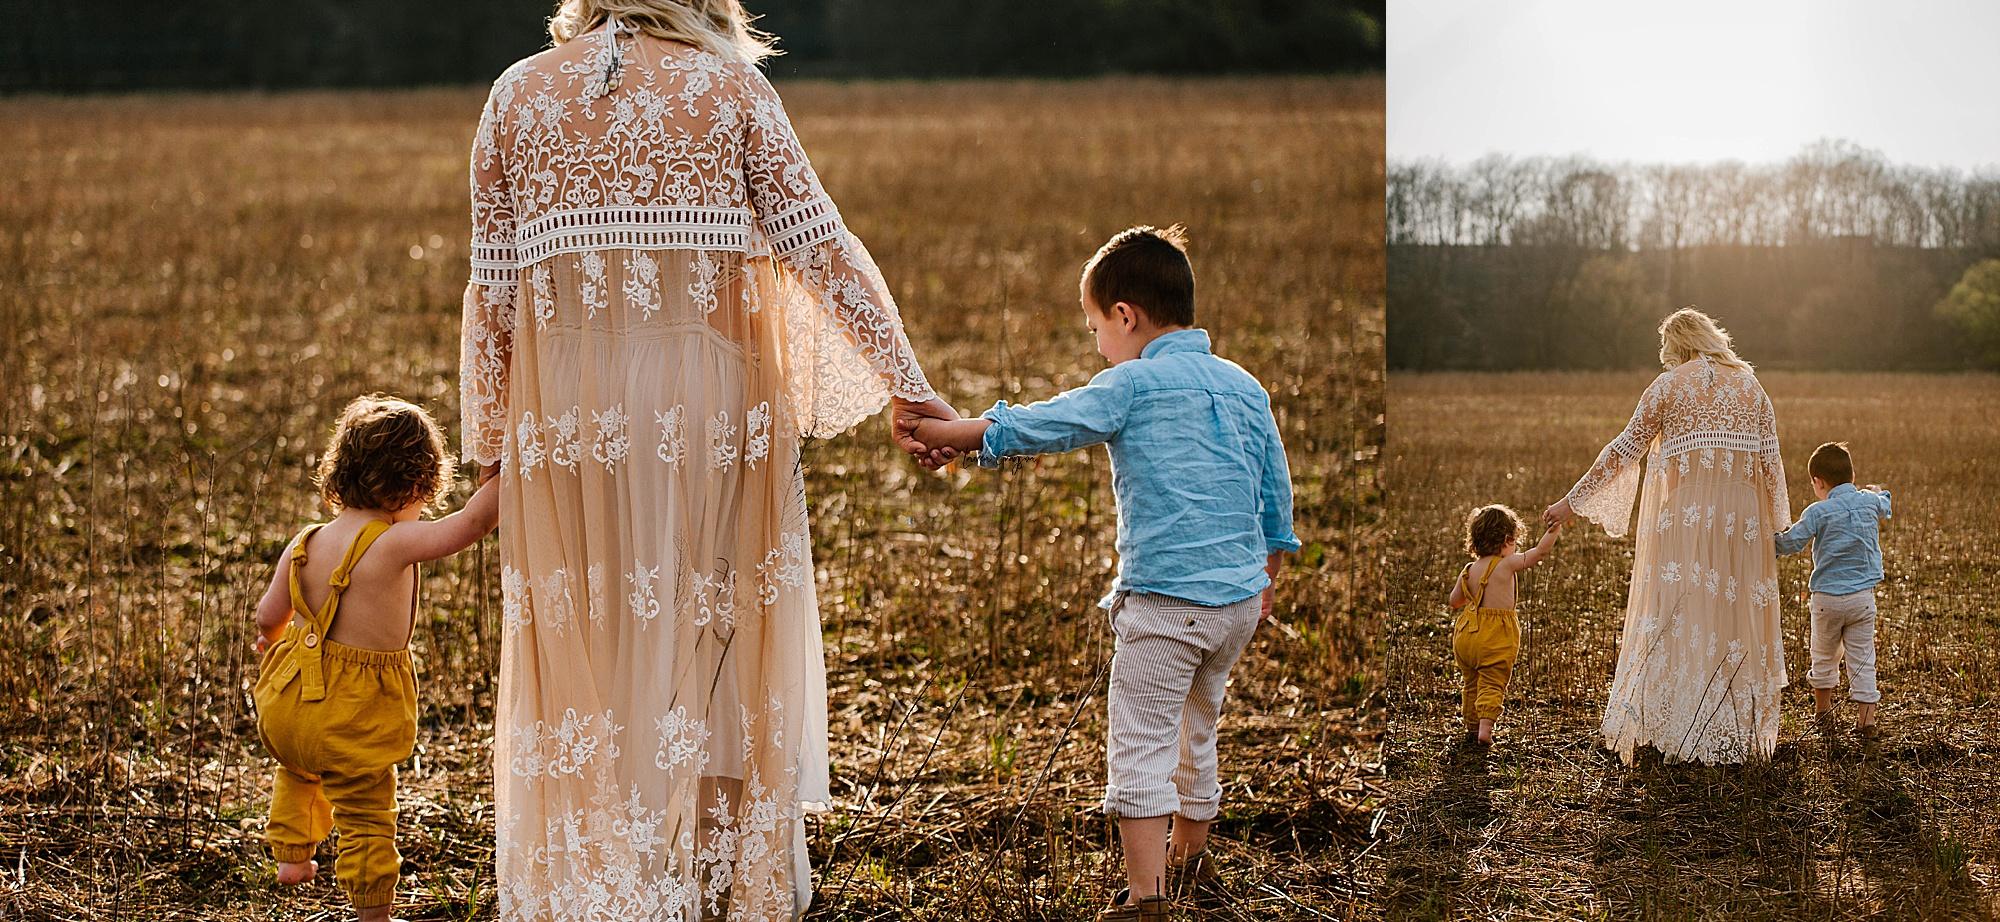 lauren-grayson-photography-akron-ohio-family-mom-boys-field-spring-outdoor-session_0017.jpg